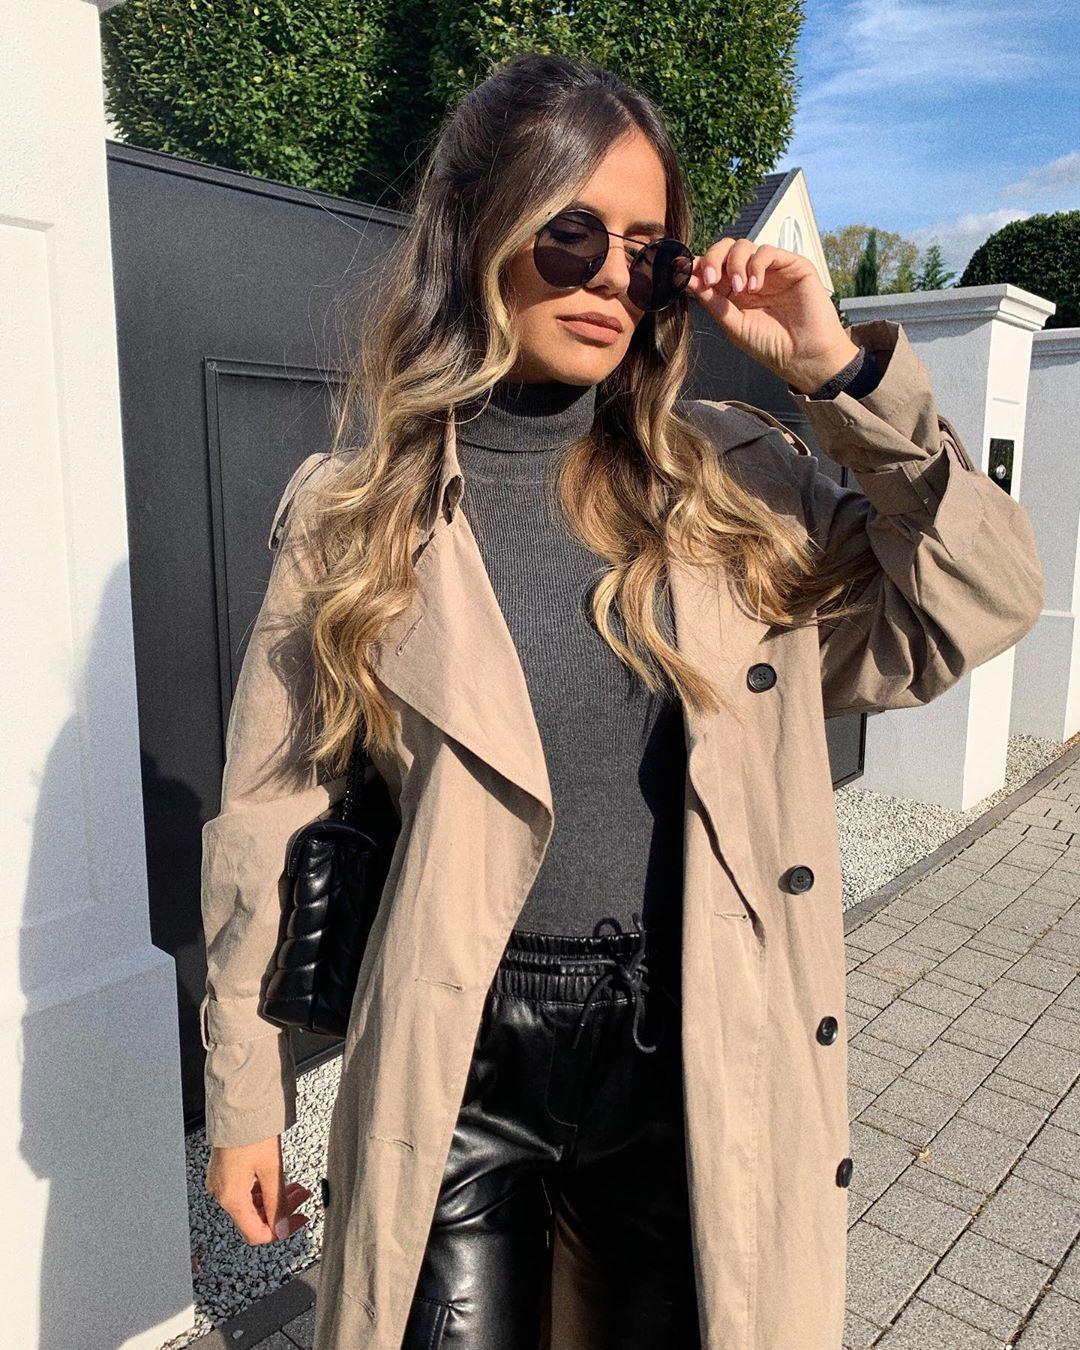 fluid trench coat with pockets de Zara sur ezgilkyaz